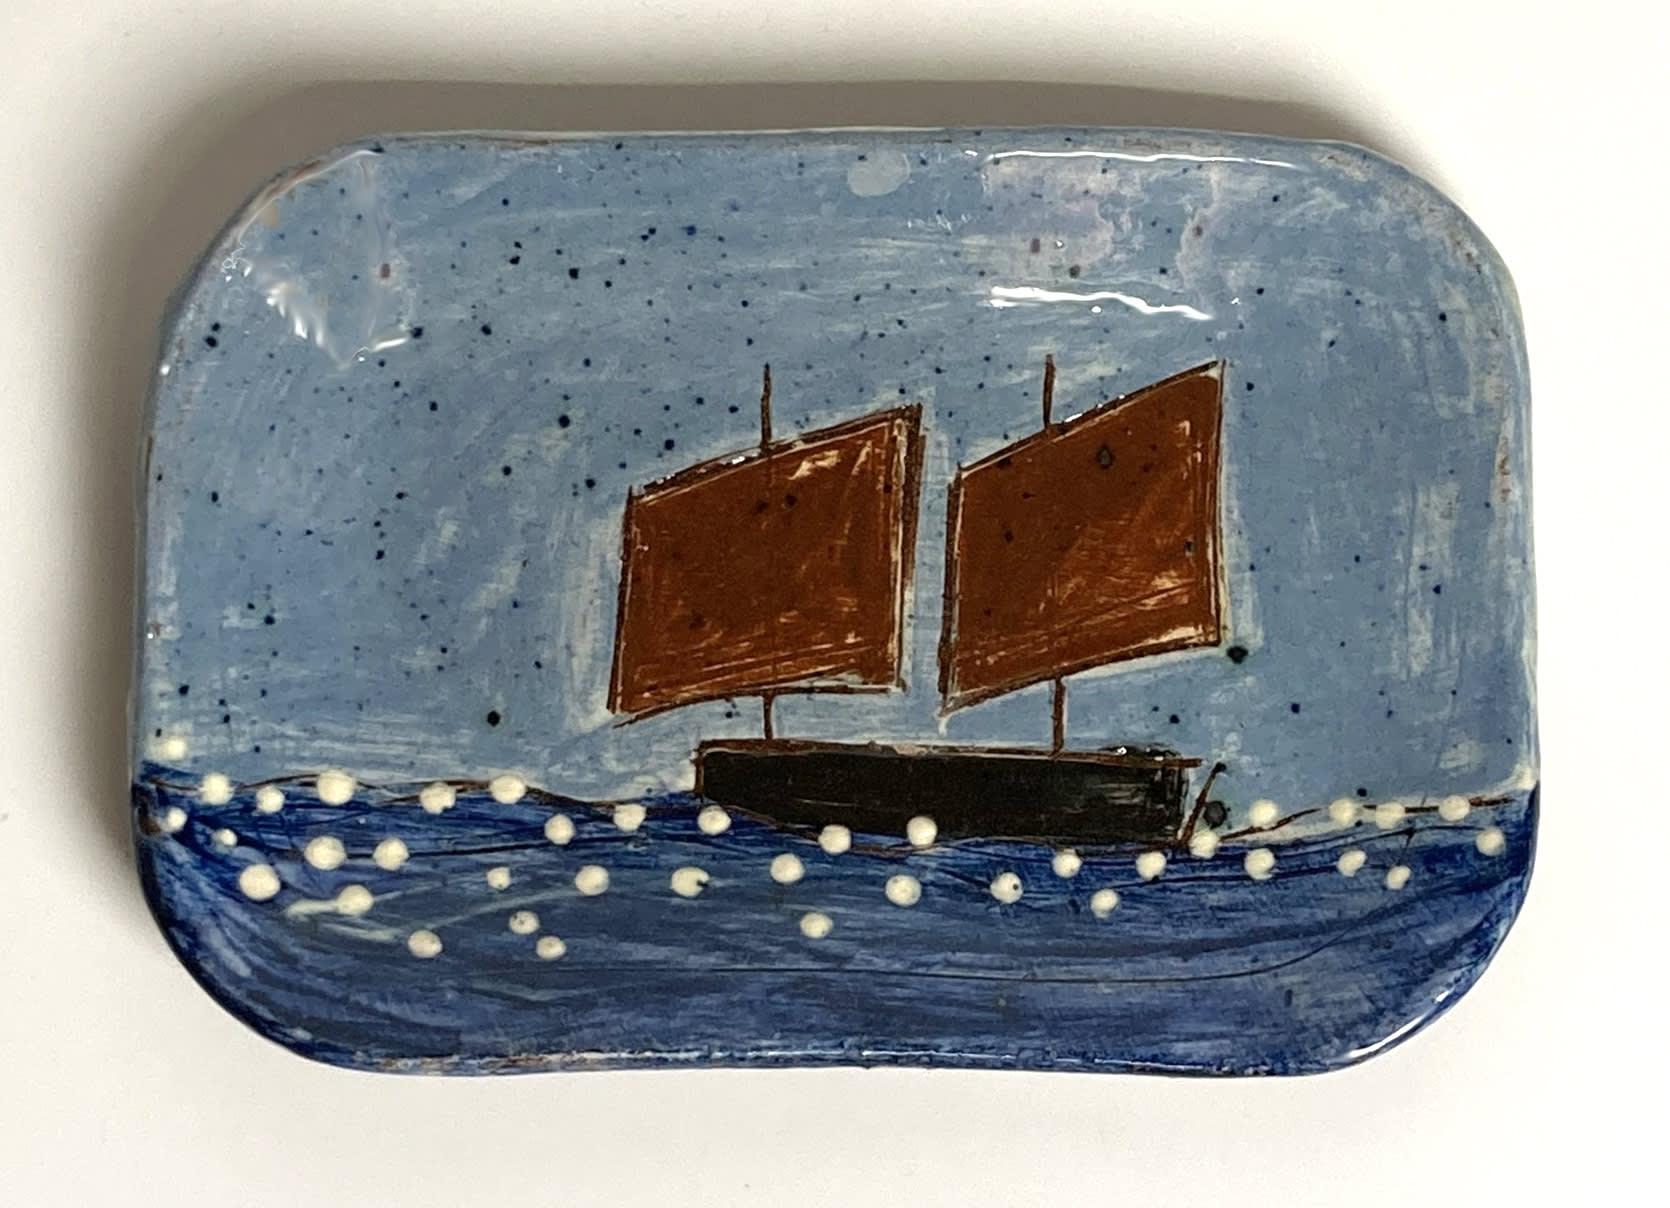 "<span class=""link fancybox-details-link""><a href=""/artists/428-anne-barrell/works/7682-anne-barrell-two-red-sails-2021/"">View Detail Page</a></span><div class=""artist""><strong>Anne Barrell</strong></div> <div class=""title""><em>Two Red Sails</em>, 2021</div> <div class=""medium"">handmade, hand-painted ceramic </div> <div class=""dimensions"">h. 12 x w. 8.5 cm </div><div class=""copyright_line"">Own Art: £4 x 10 Months, 0% APR</div>"